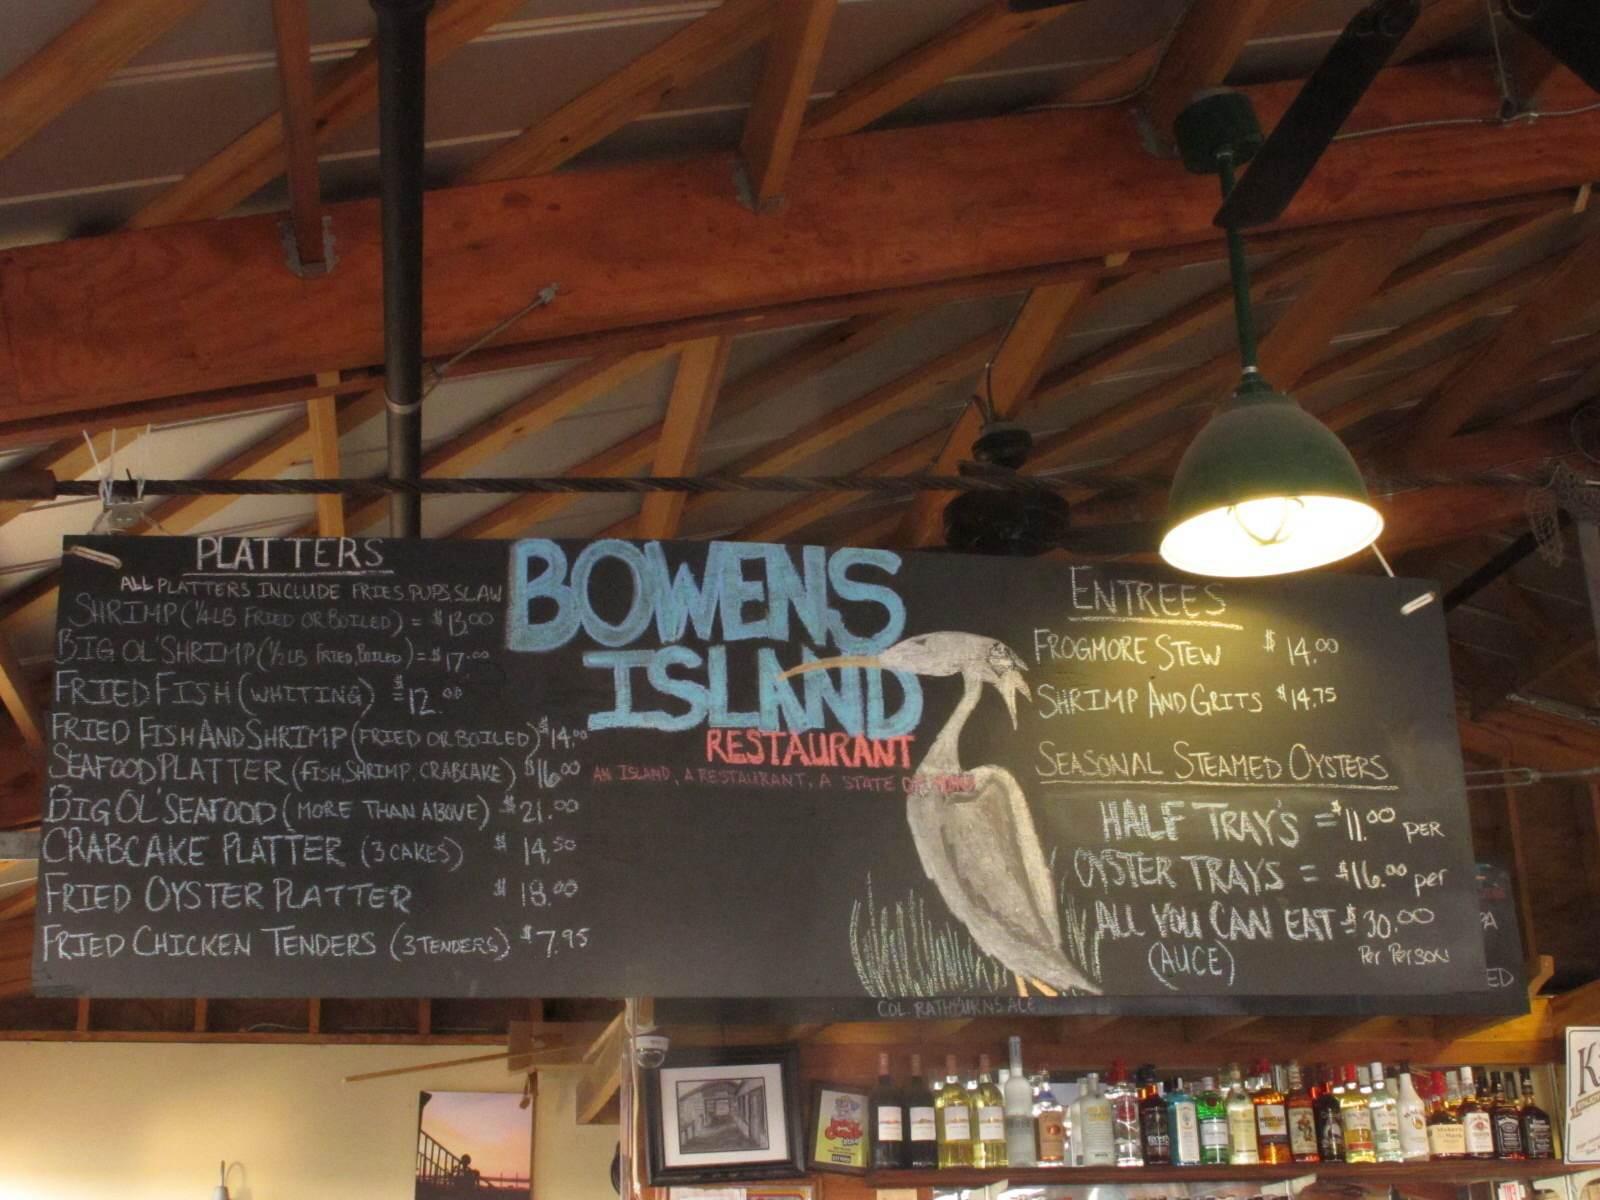 Bowen's Island Restaurant - Charleston, SC